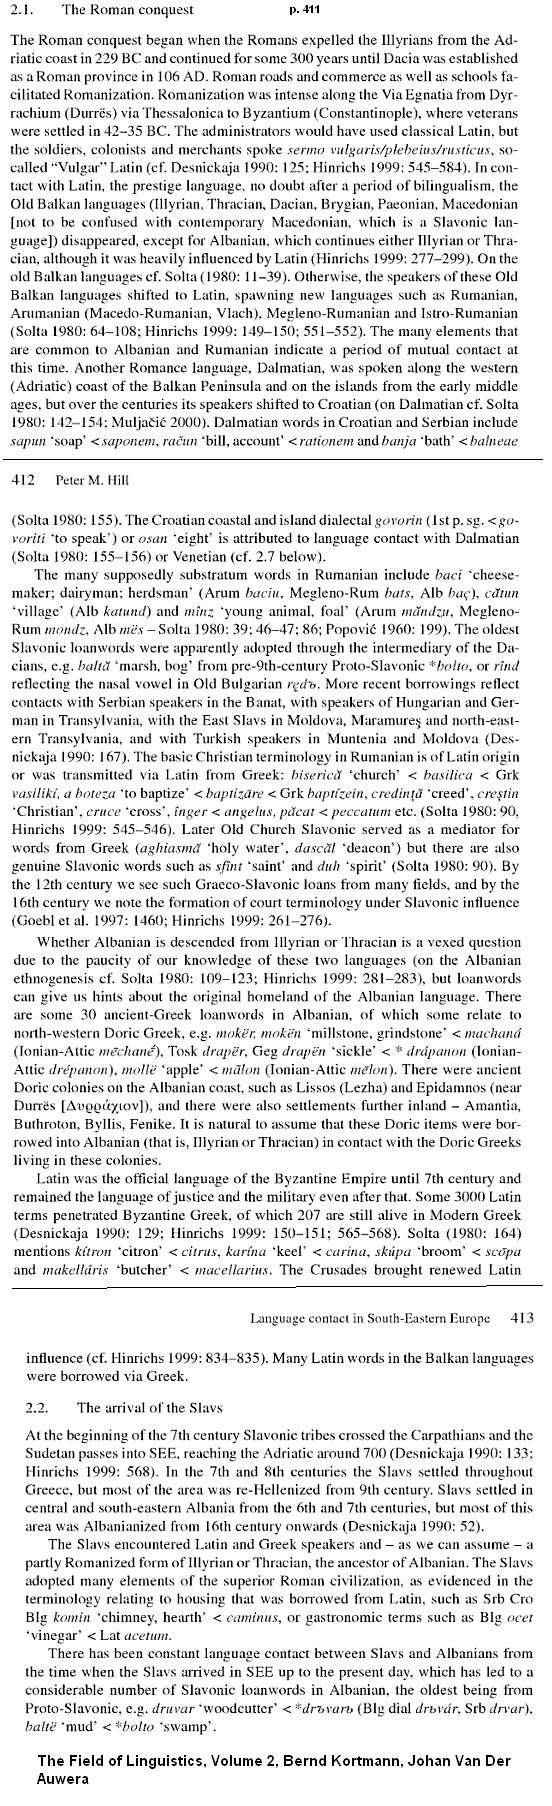 DOKUMENTE PEJ AUSTRALIE - Faqe 4 1_bmp26